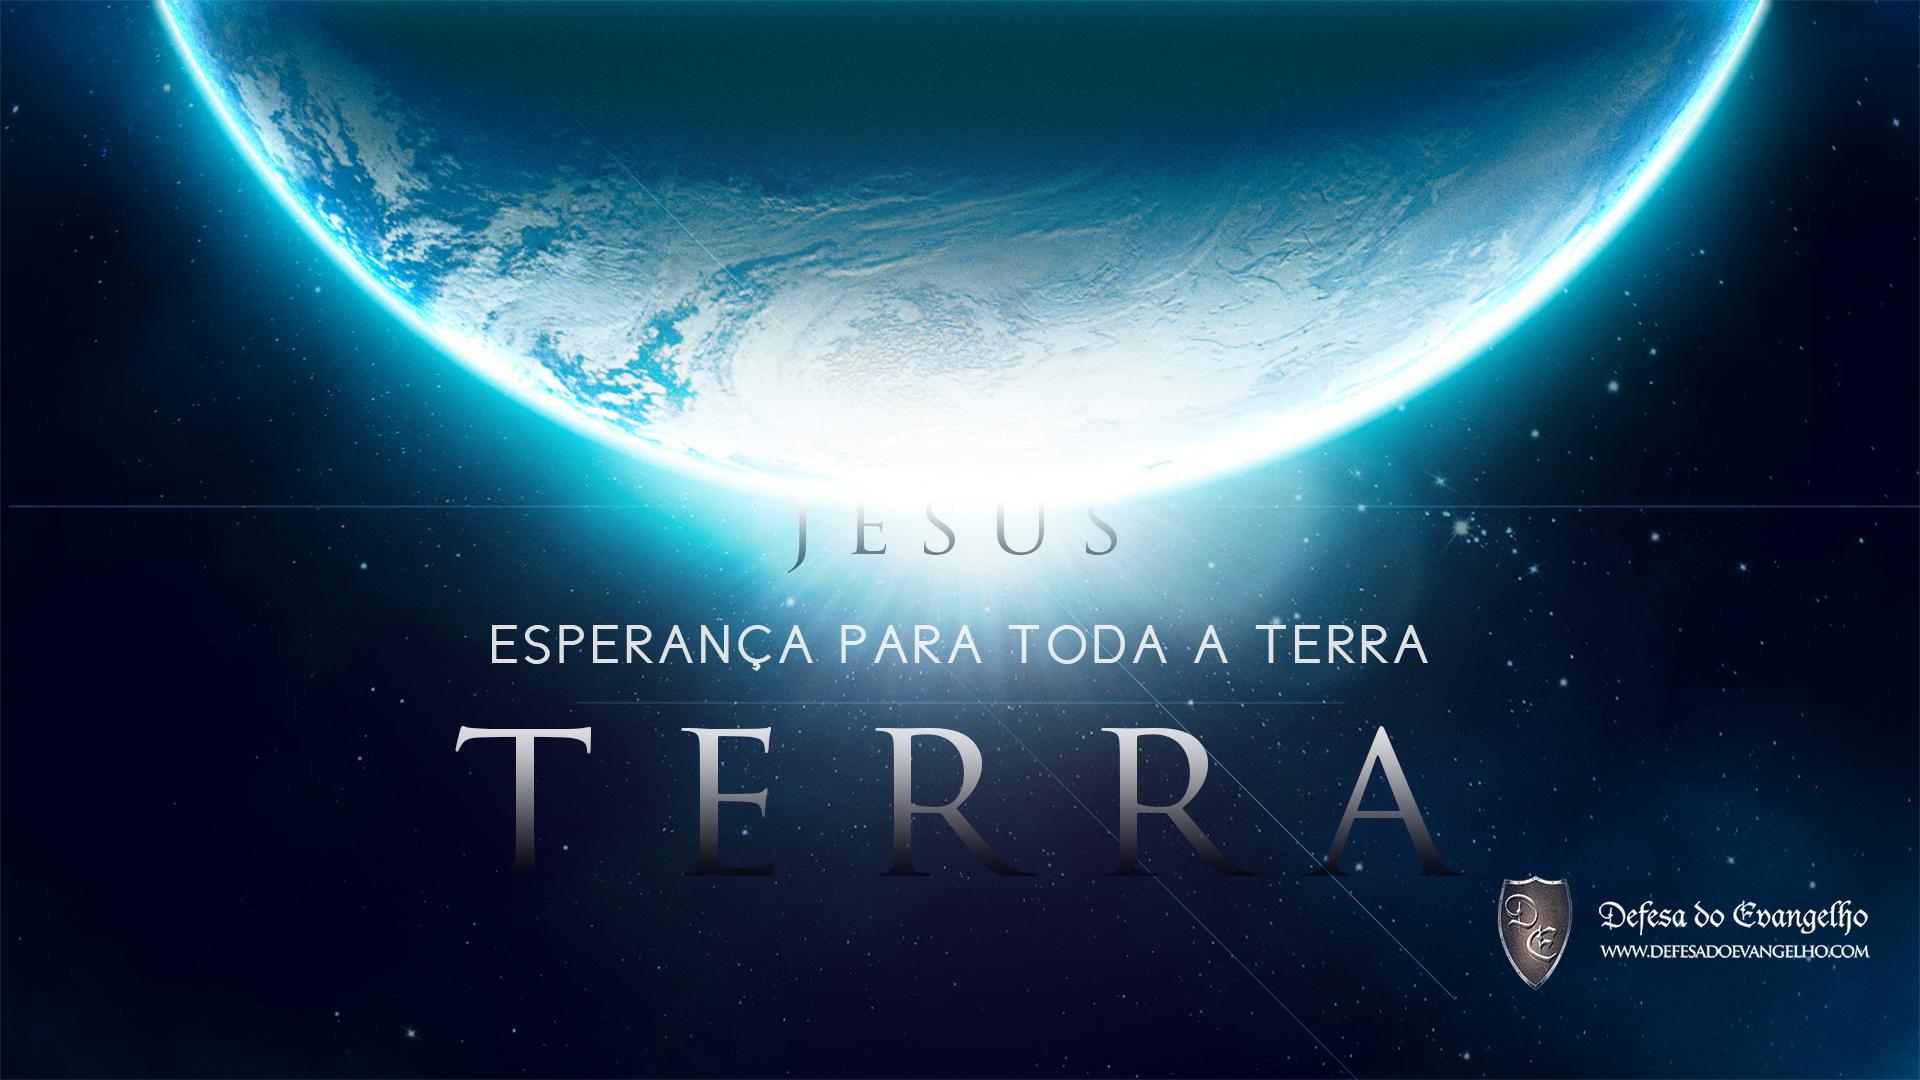 jesus-esperanca-de-toda-terra